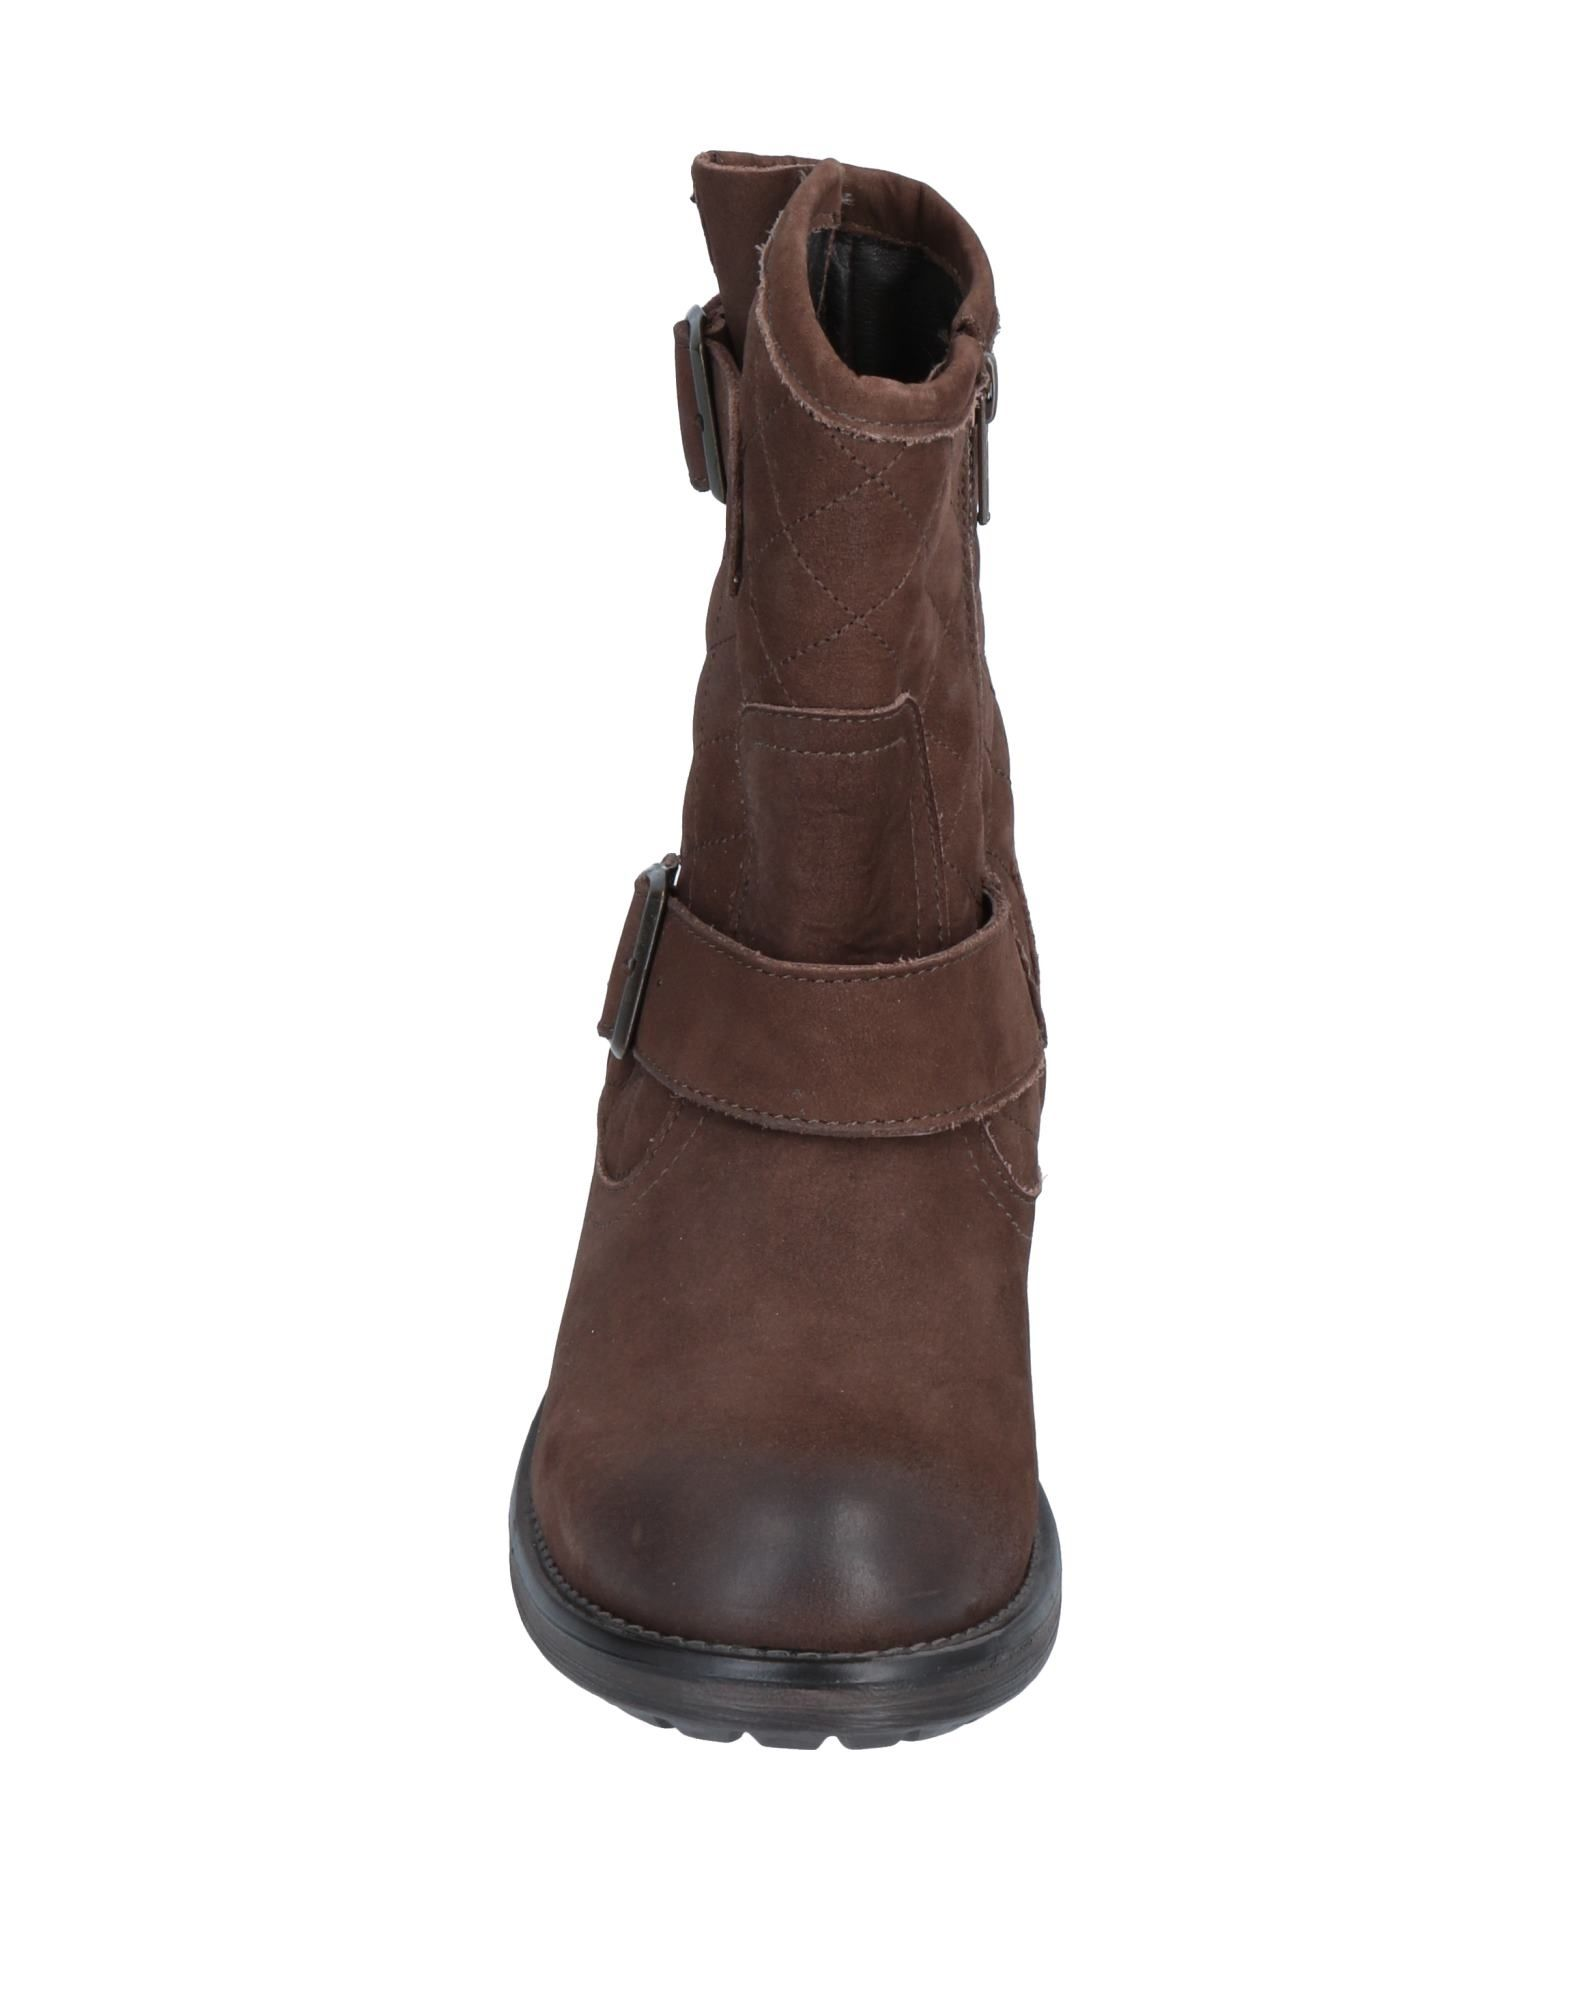 Steve Qualität Madden Stiefelette Damen  11616002XN Gute Qualität Steve beliebte Schuhe 95b836